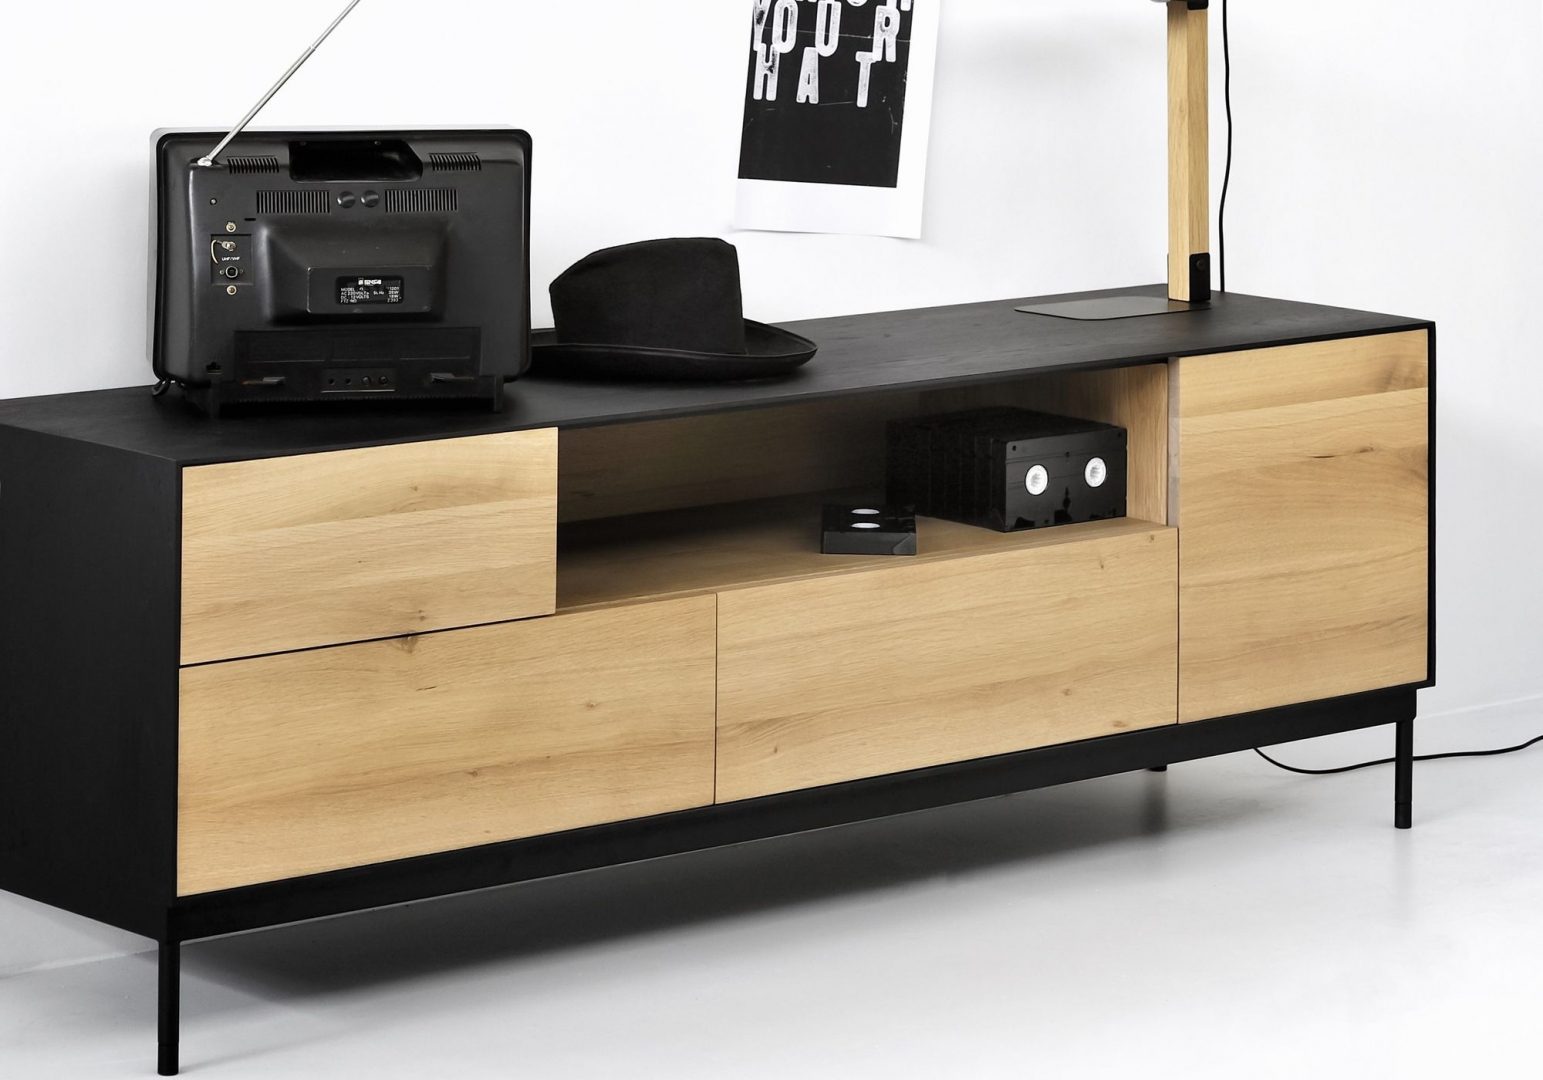 Meuble TV Blackbird en chêne - ETHNICRAFT